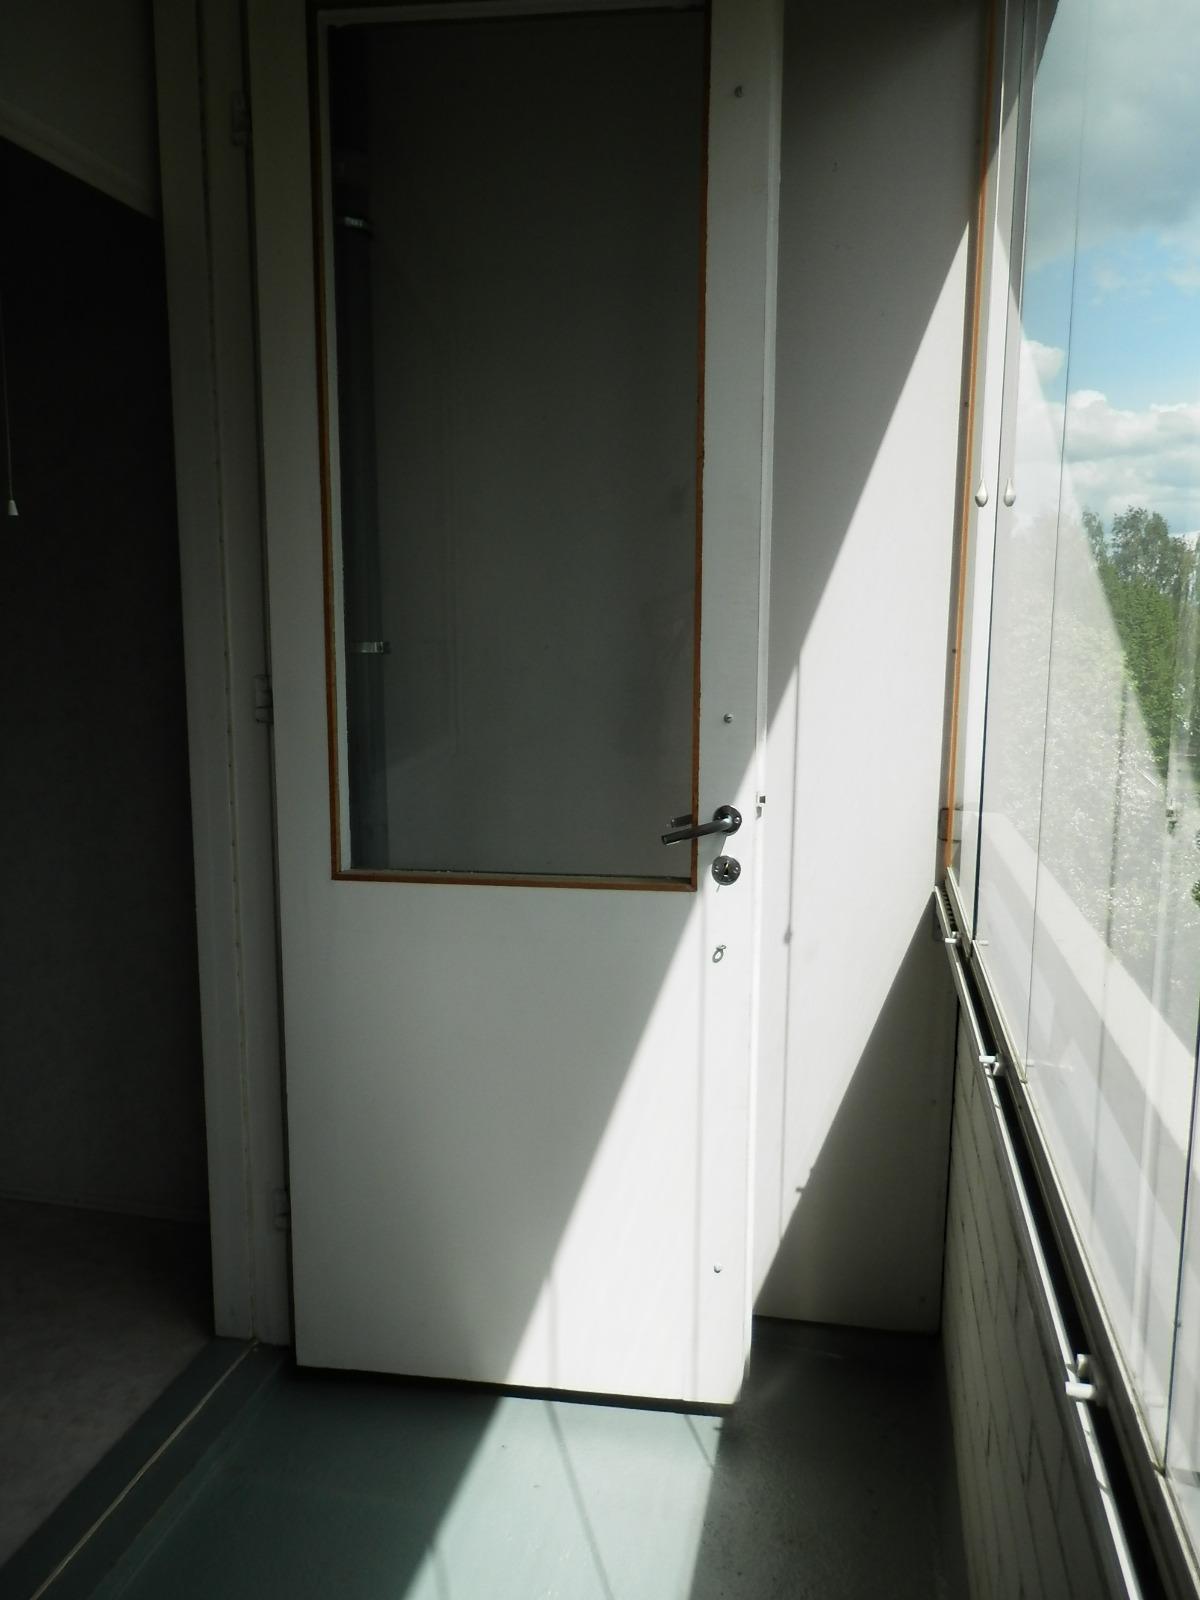 Kalevalankatu 11 A, Loimaa